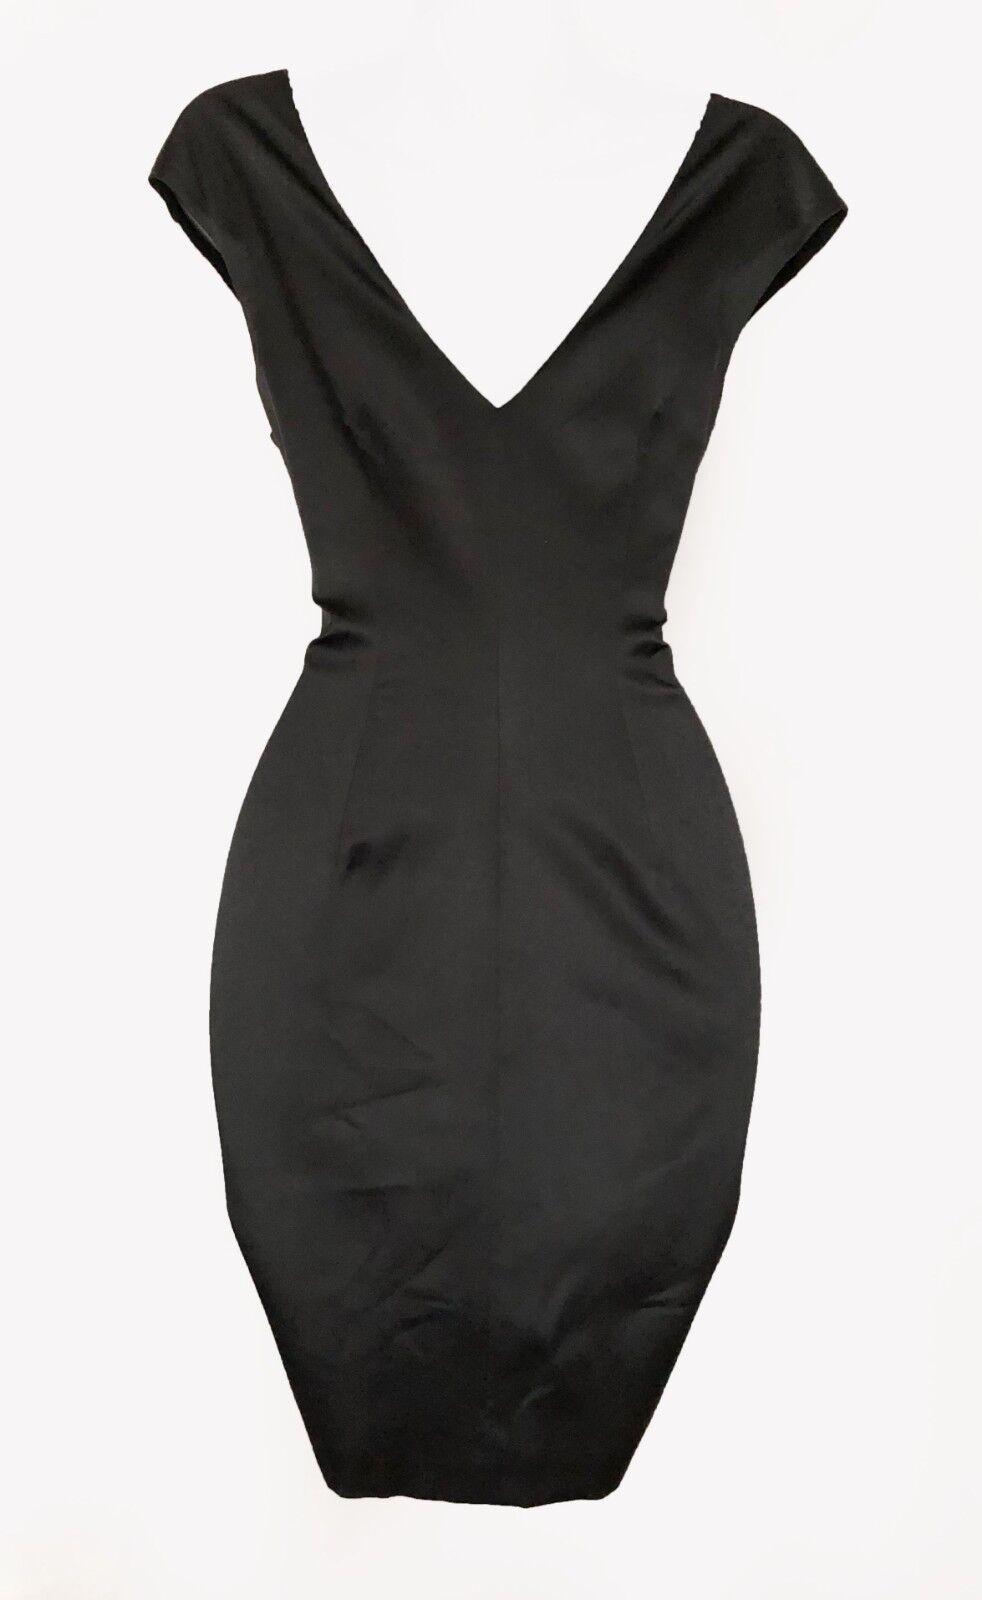 KAREN KAREN KAREN MILLEN UK 10 Silk Satin Mini Glass Print Cocktail Party Race Dress DM179 e27811